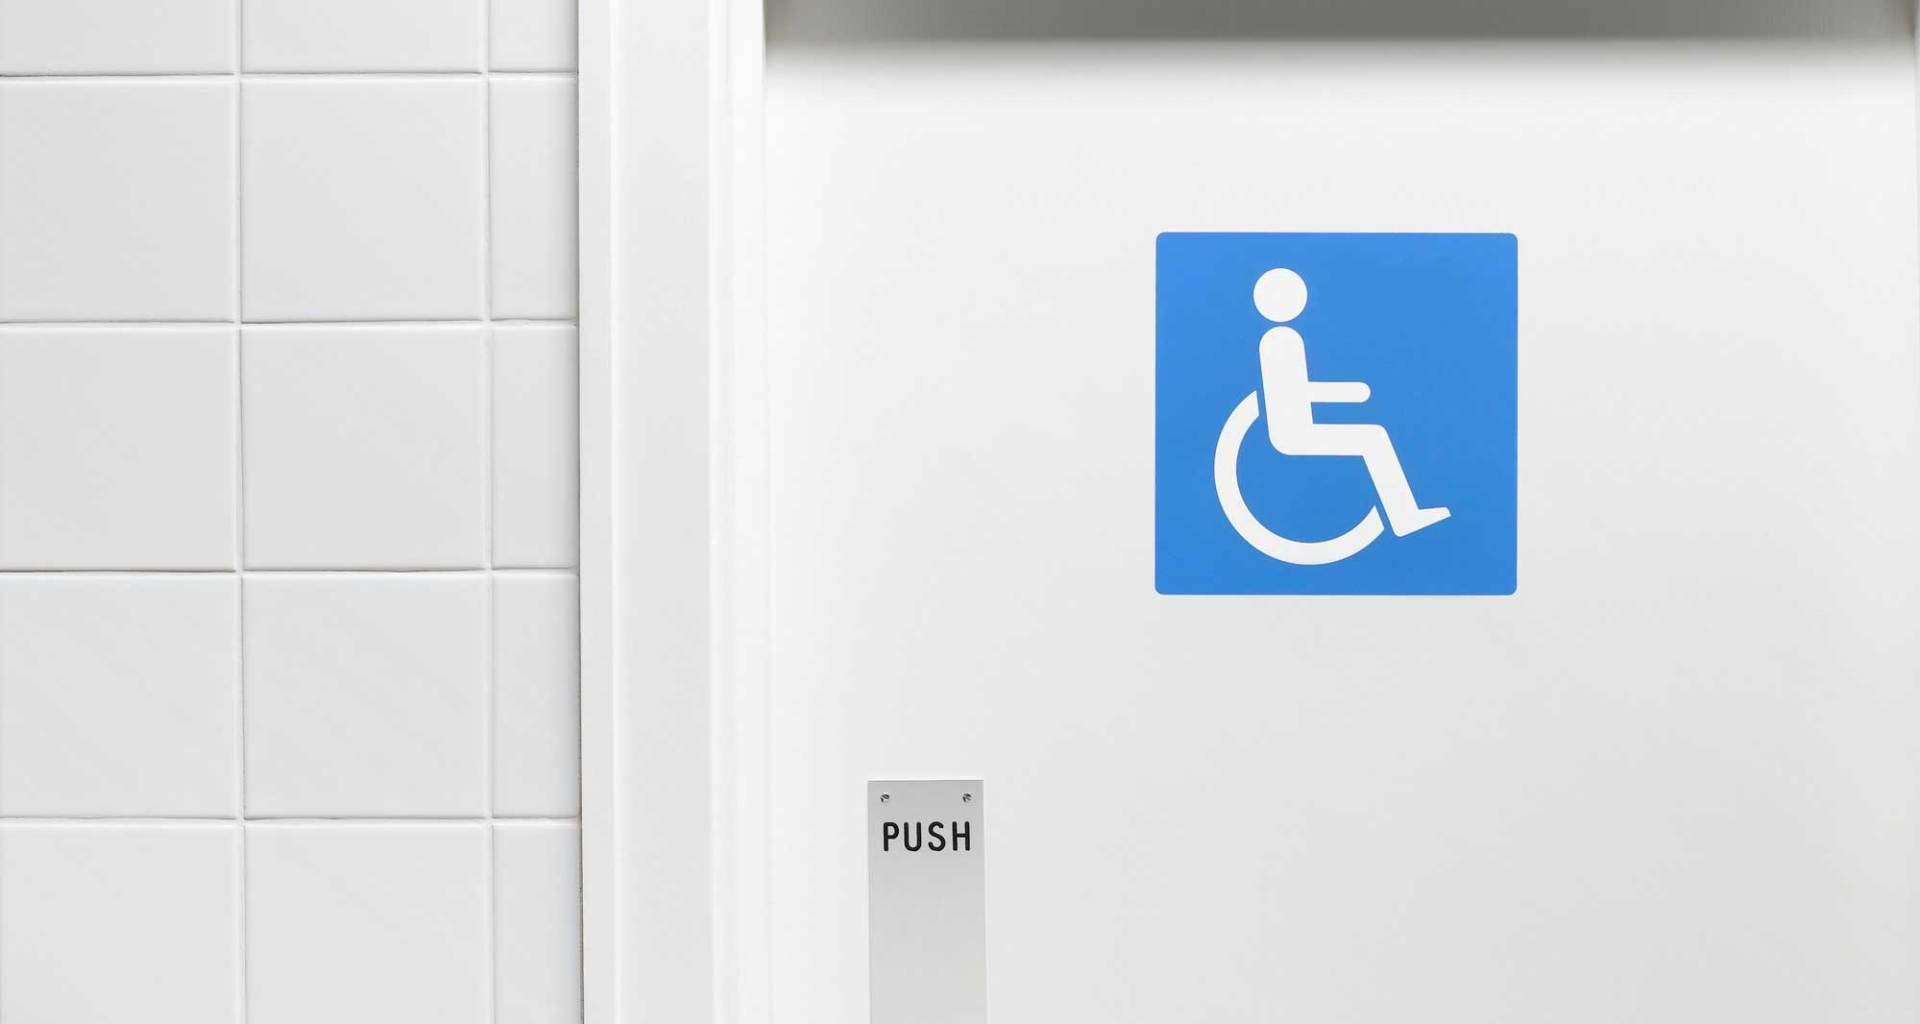 Blue wheelchair icon on white door to bathroom.